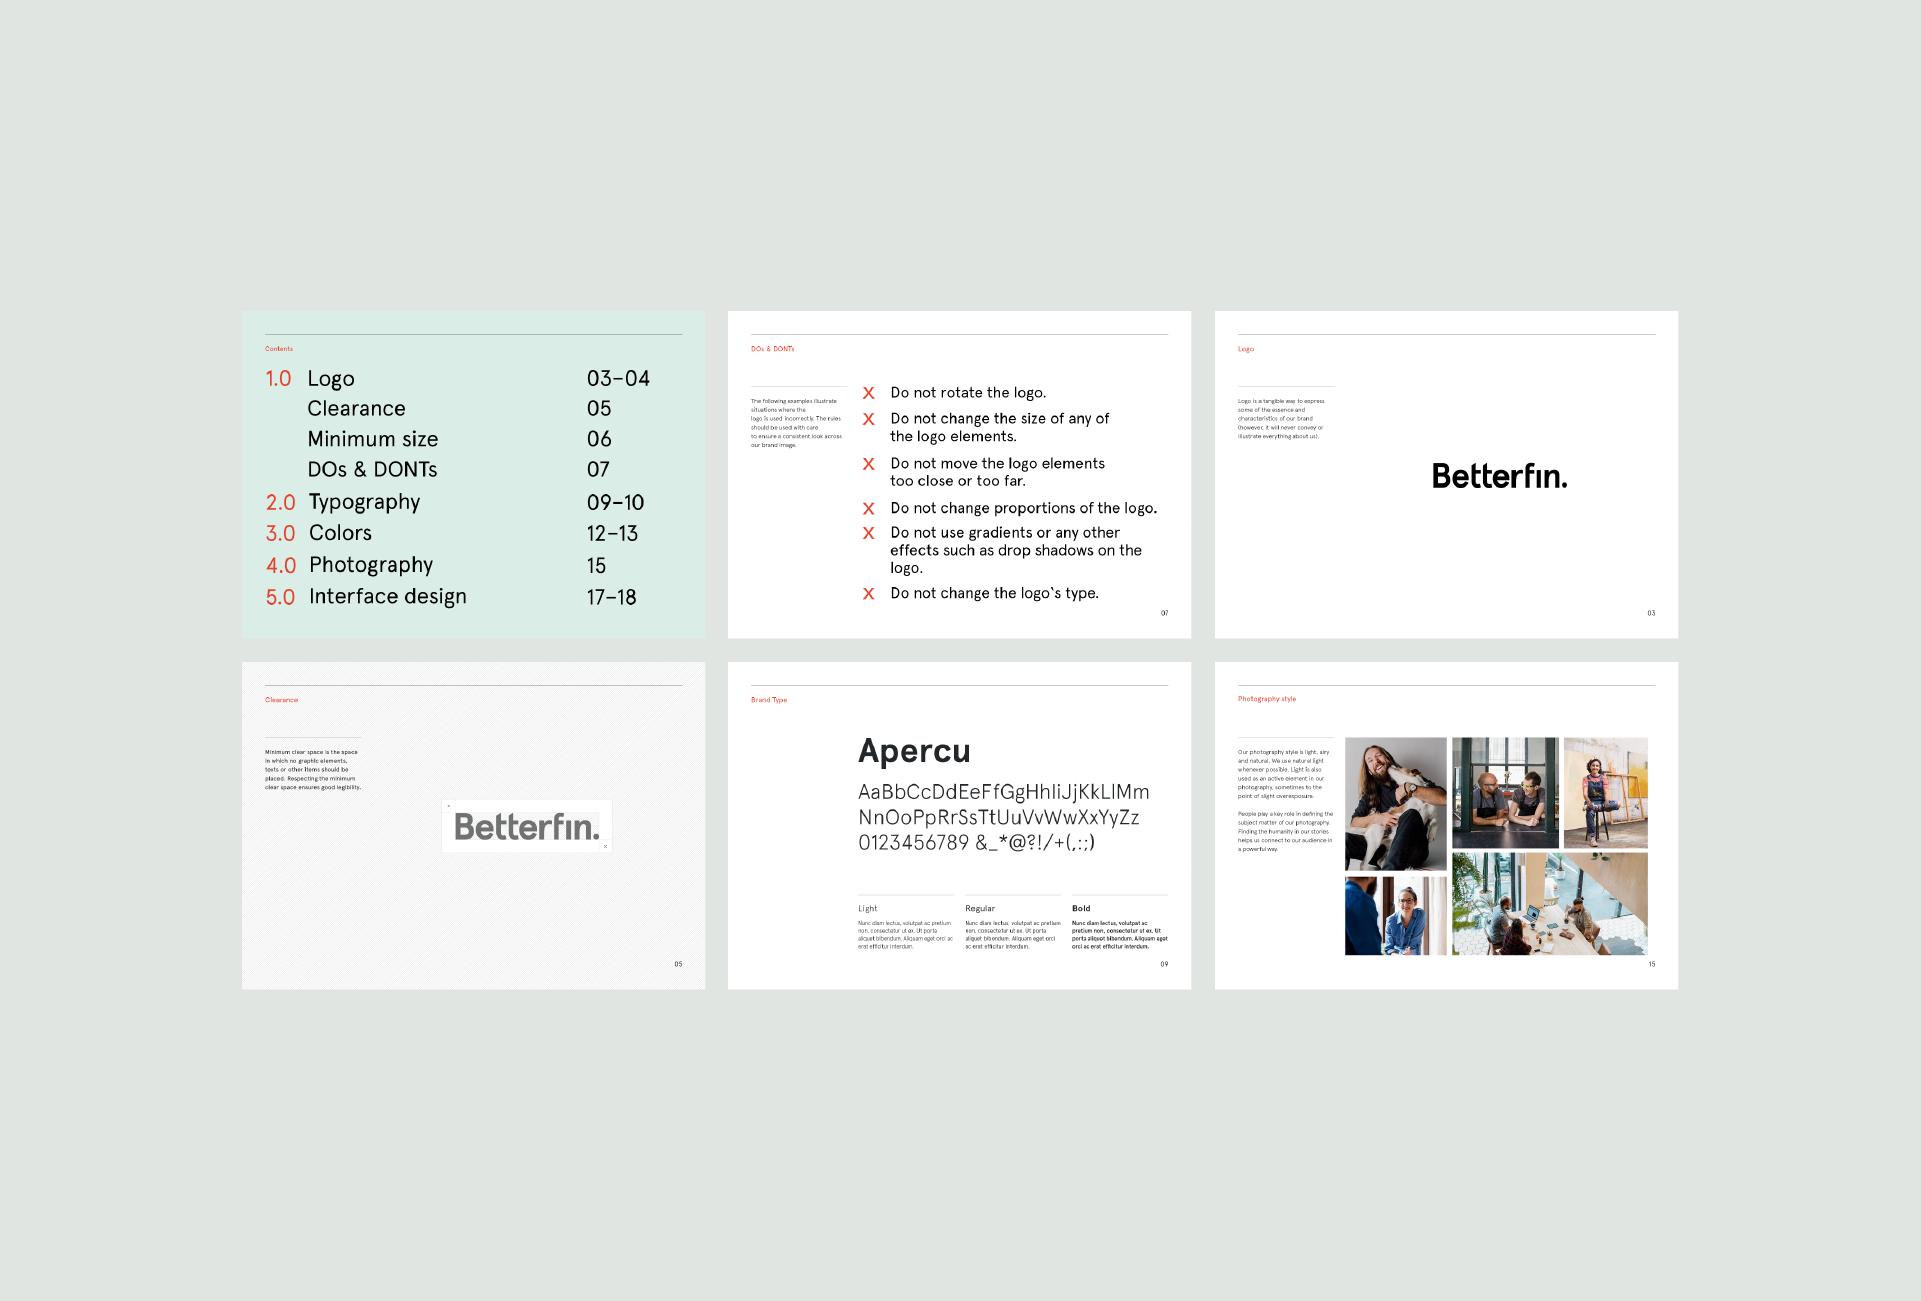 Betterfin guidelines mfiasova Logo Identity Pinterest